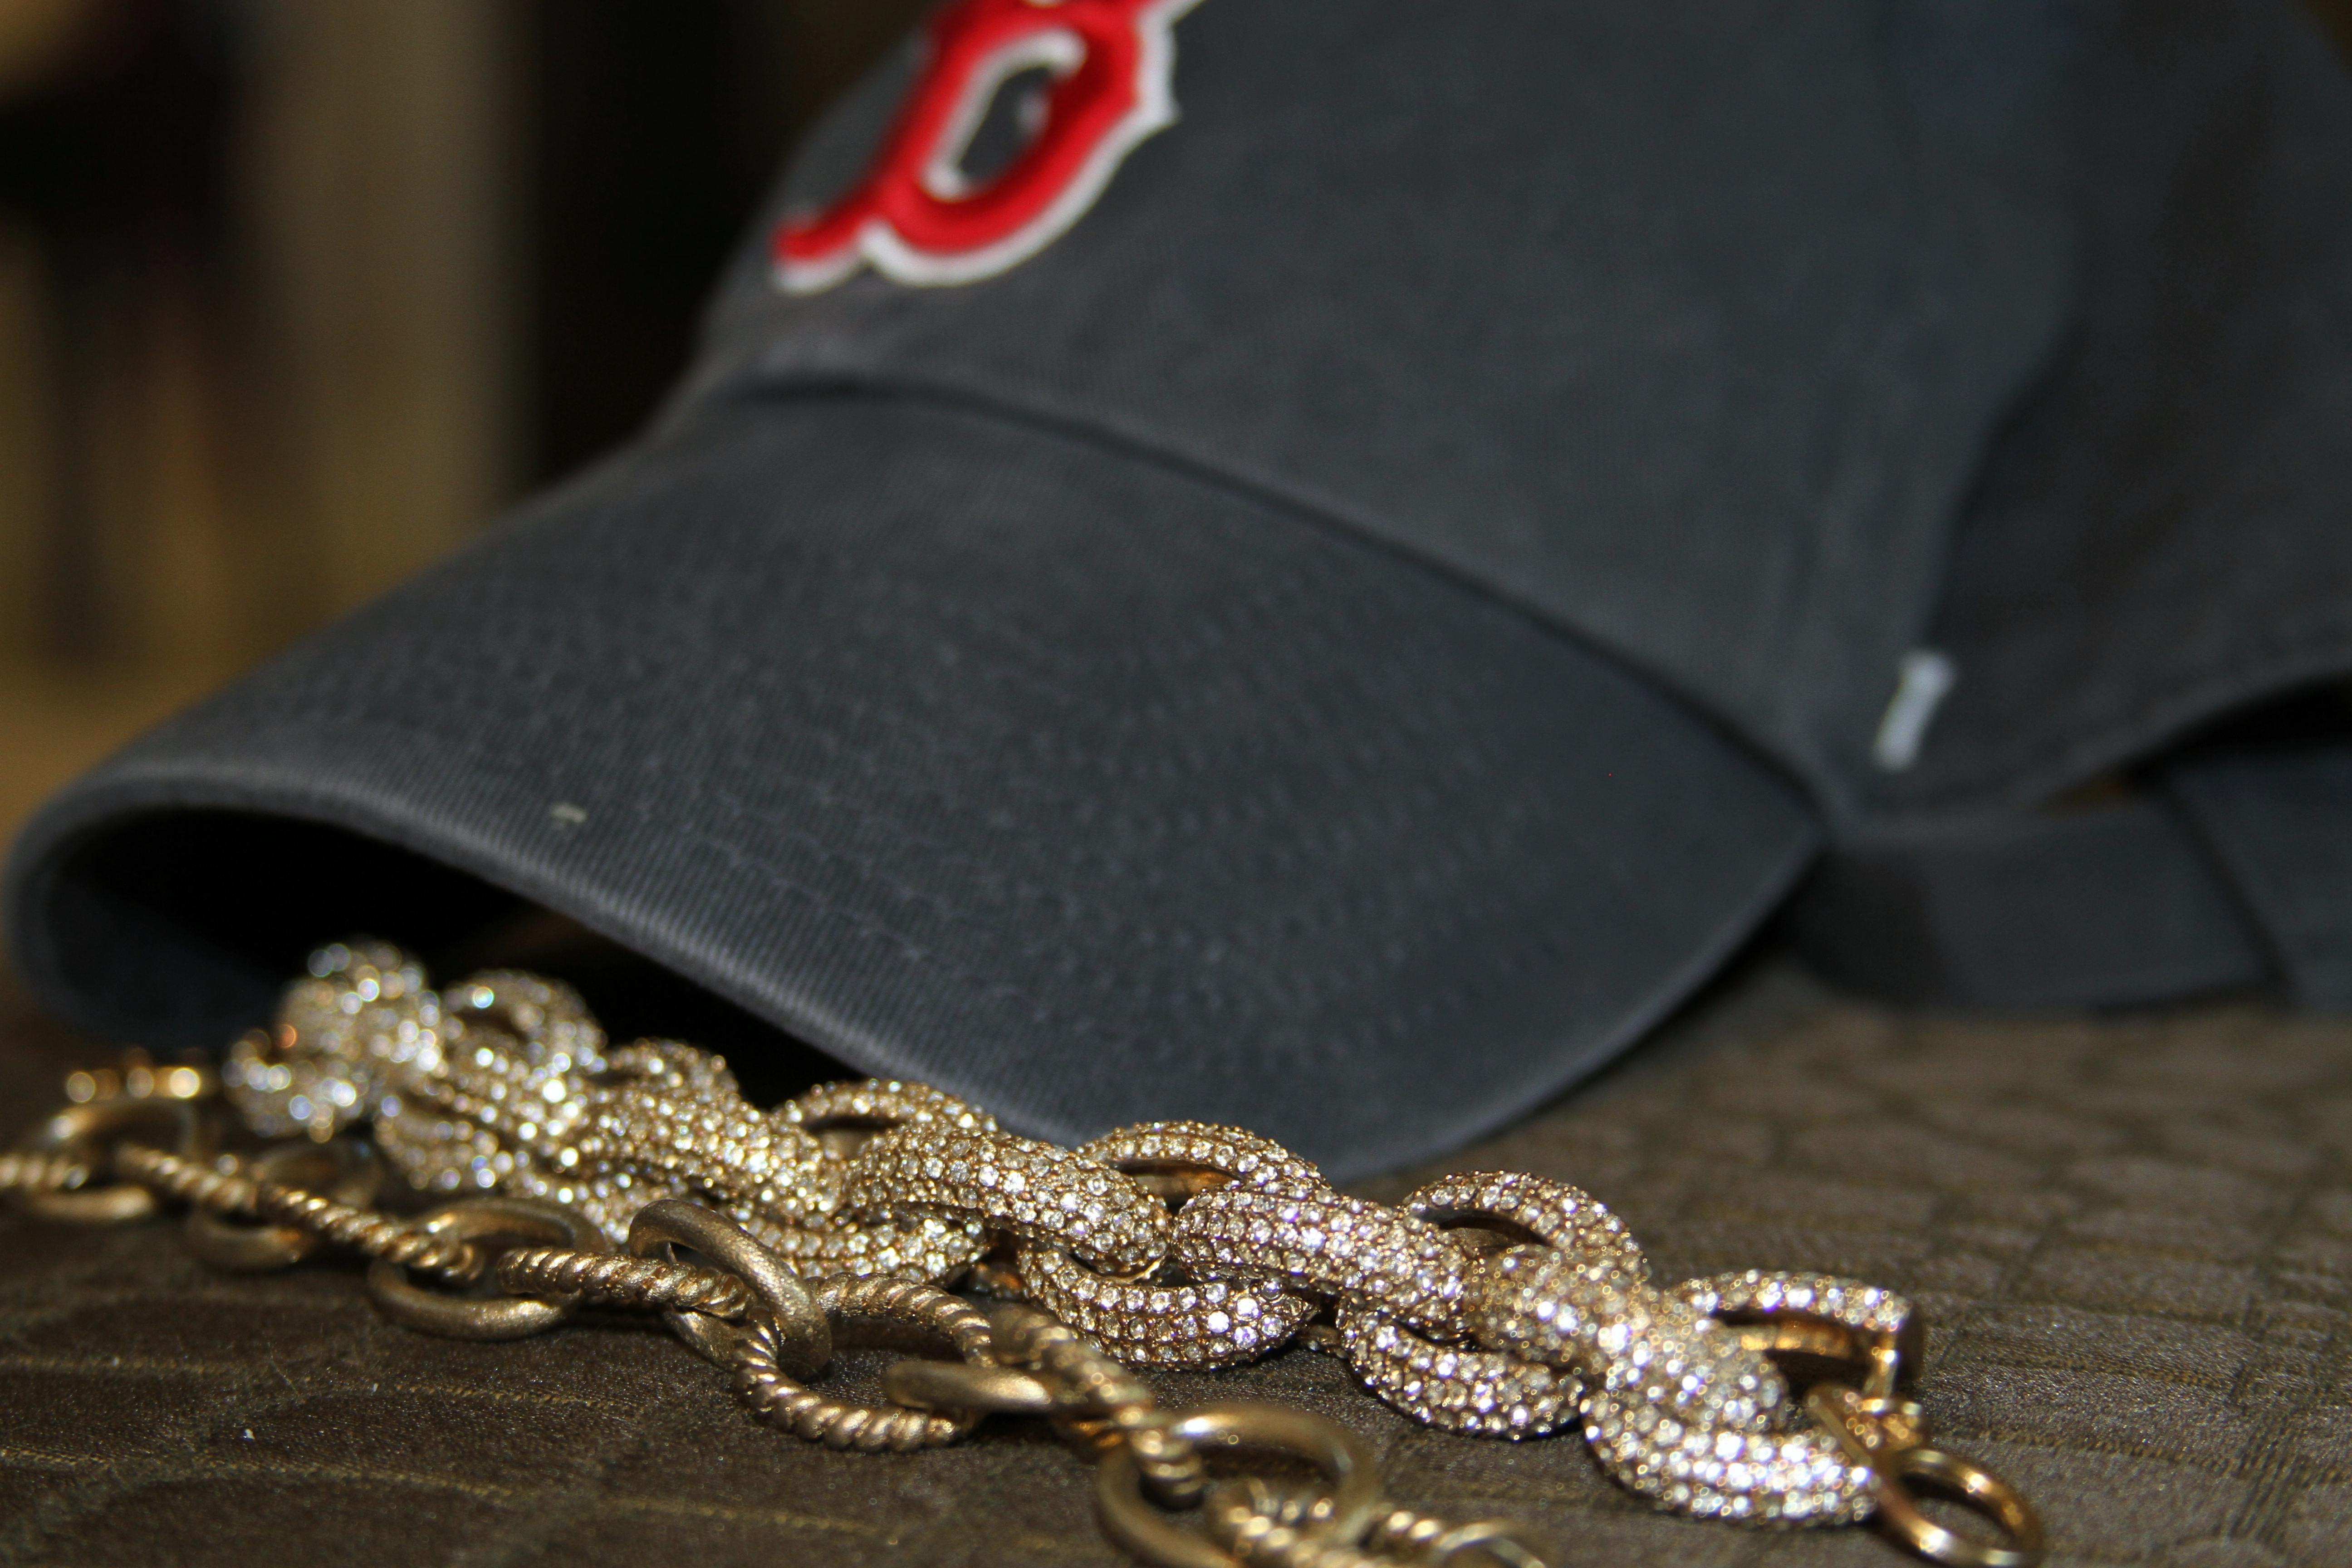 Basbeall Cap Gold Link  Bracelets